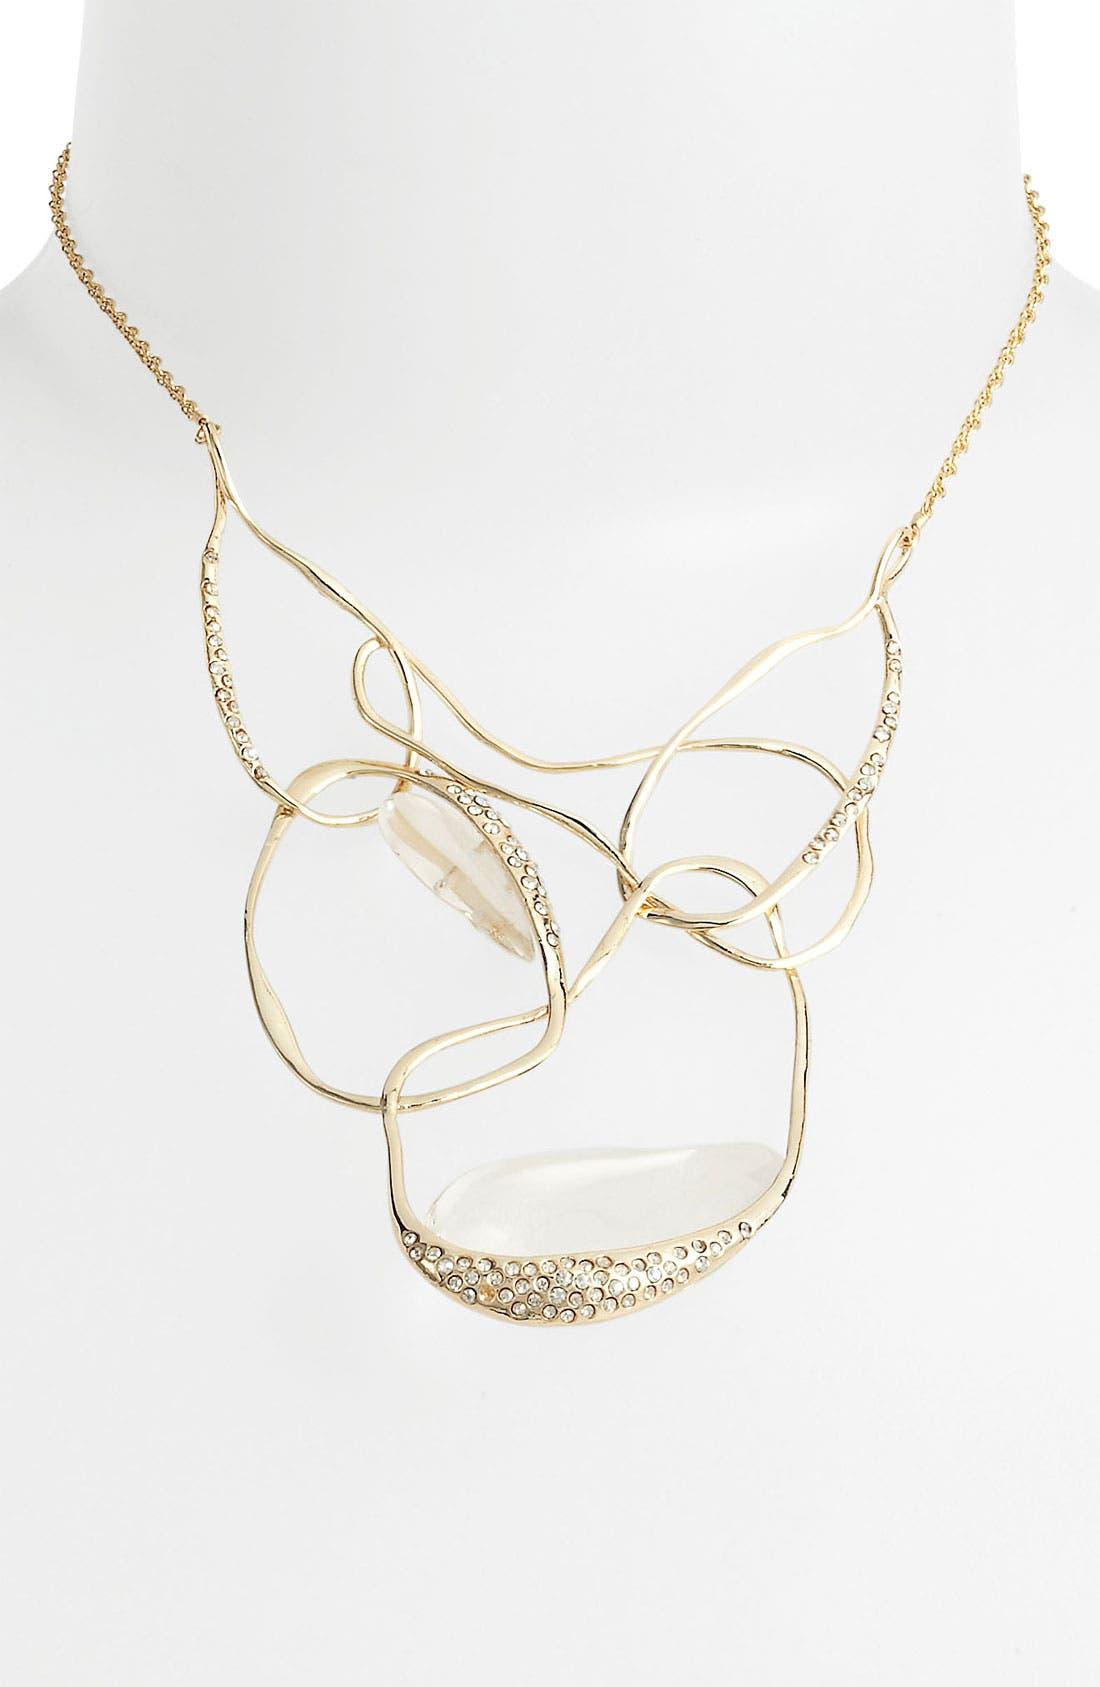 Main Image - Alexis Bittar 'Lucite® - Ophelia' Vine Bib Necklace